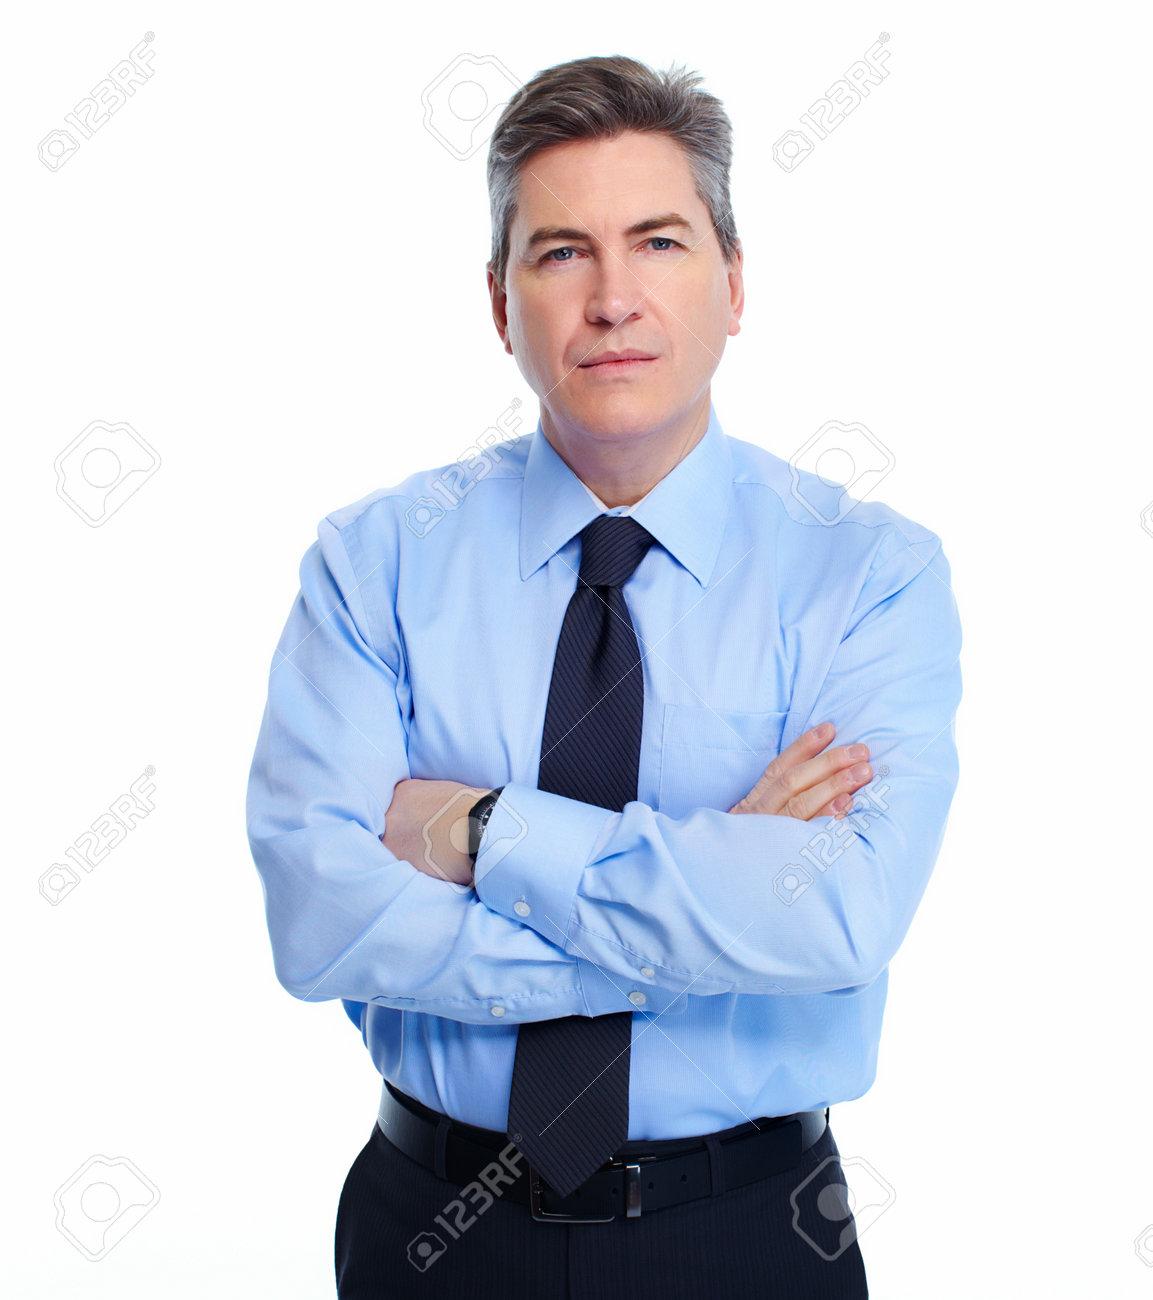 Businessman isolated on white Stock Photo - 21411283